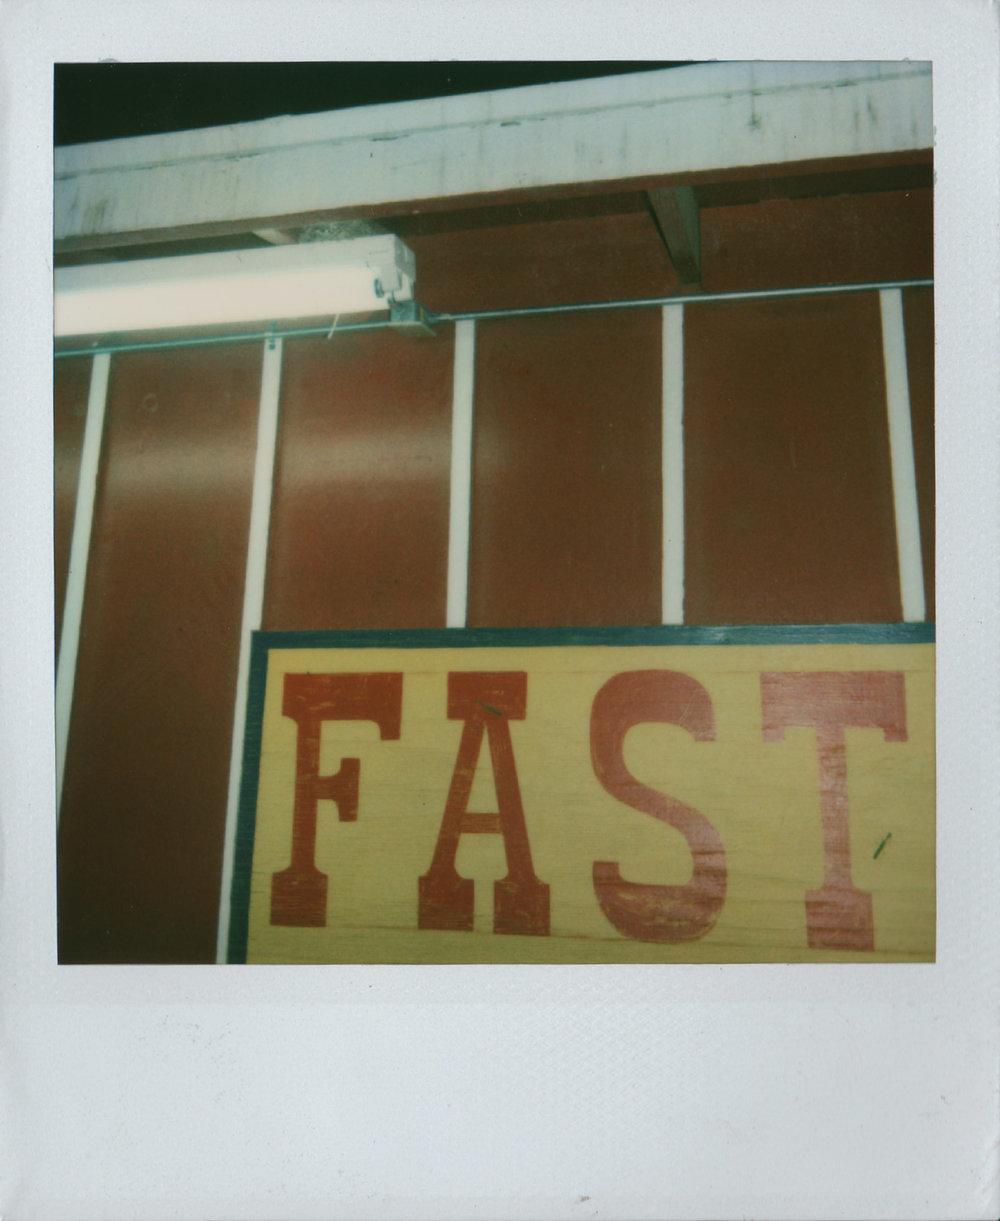 Fast lies